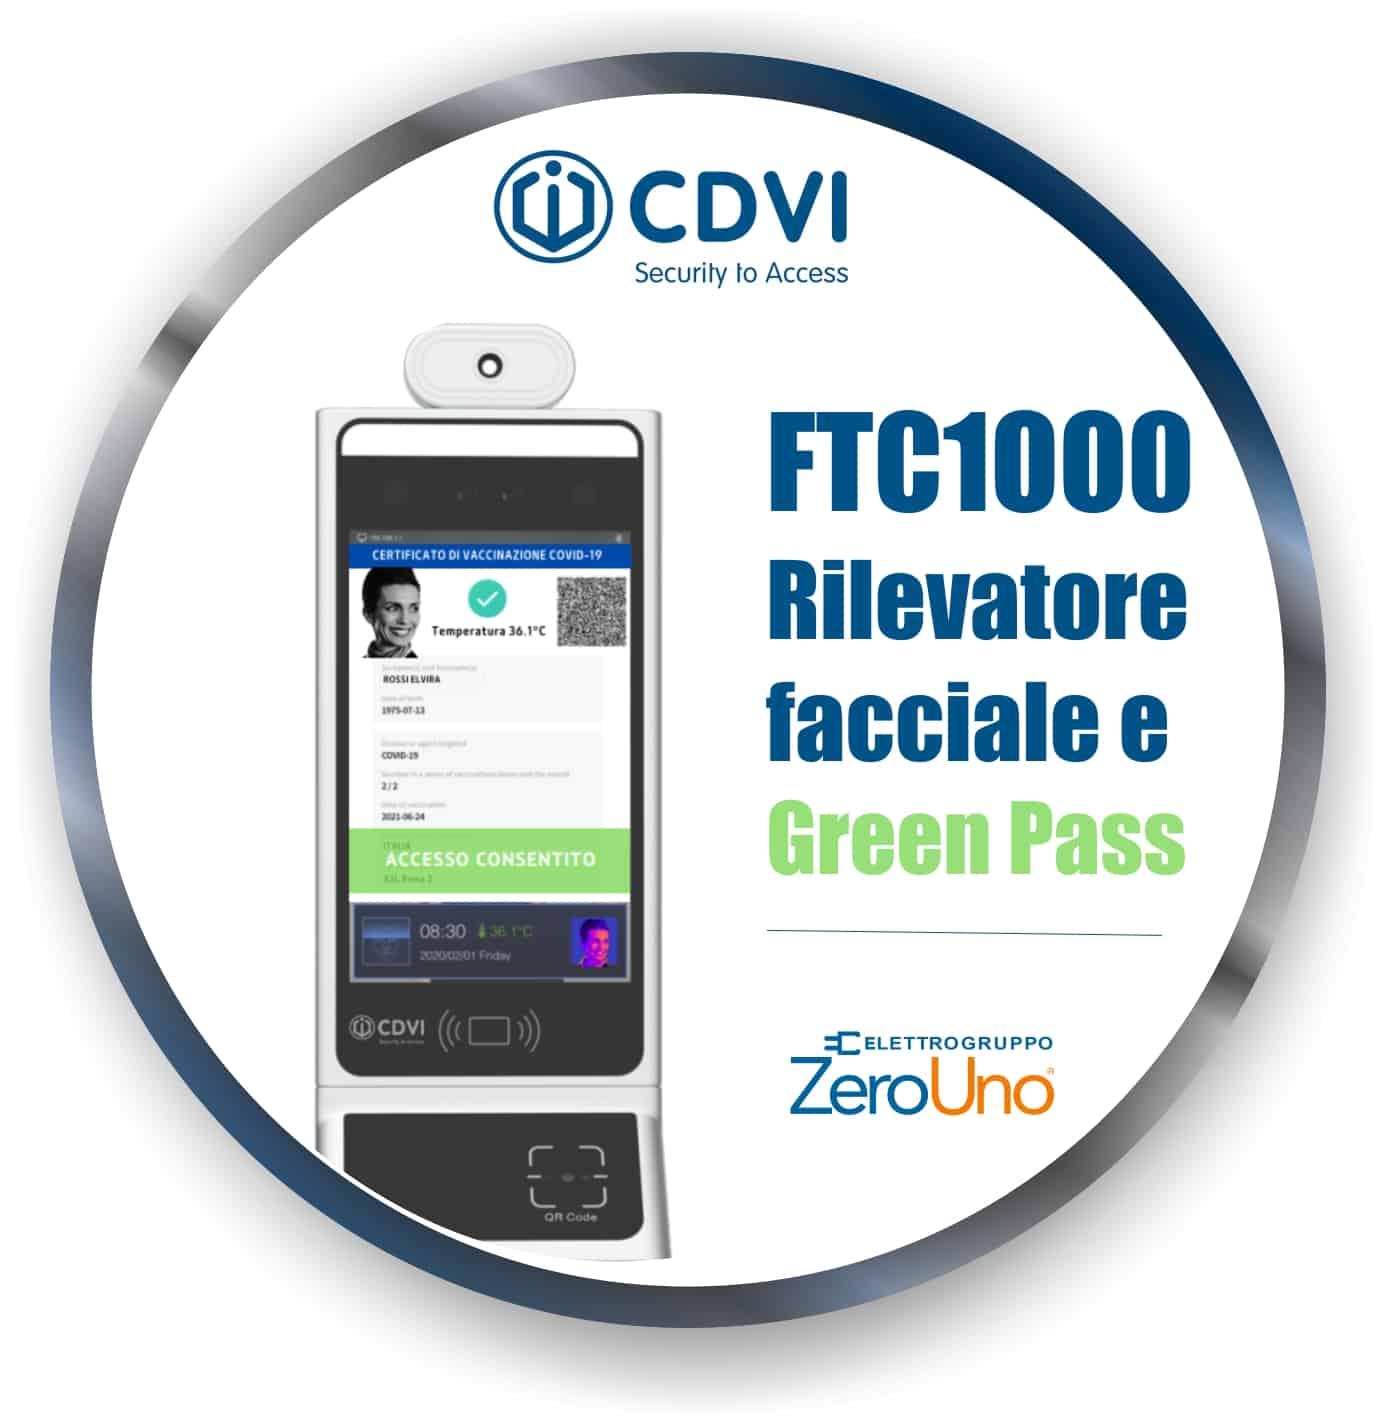 FTC1000 Rilevatore Green Pass   Elettrogruppo ZeroUno   Beinasco   TO   RILEVATORE GREEN PASS CDVI COVER